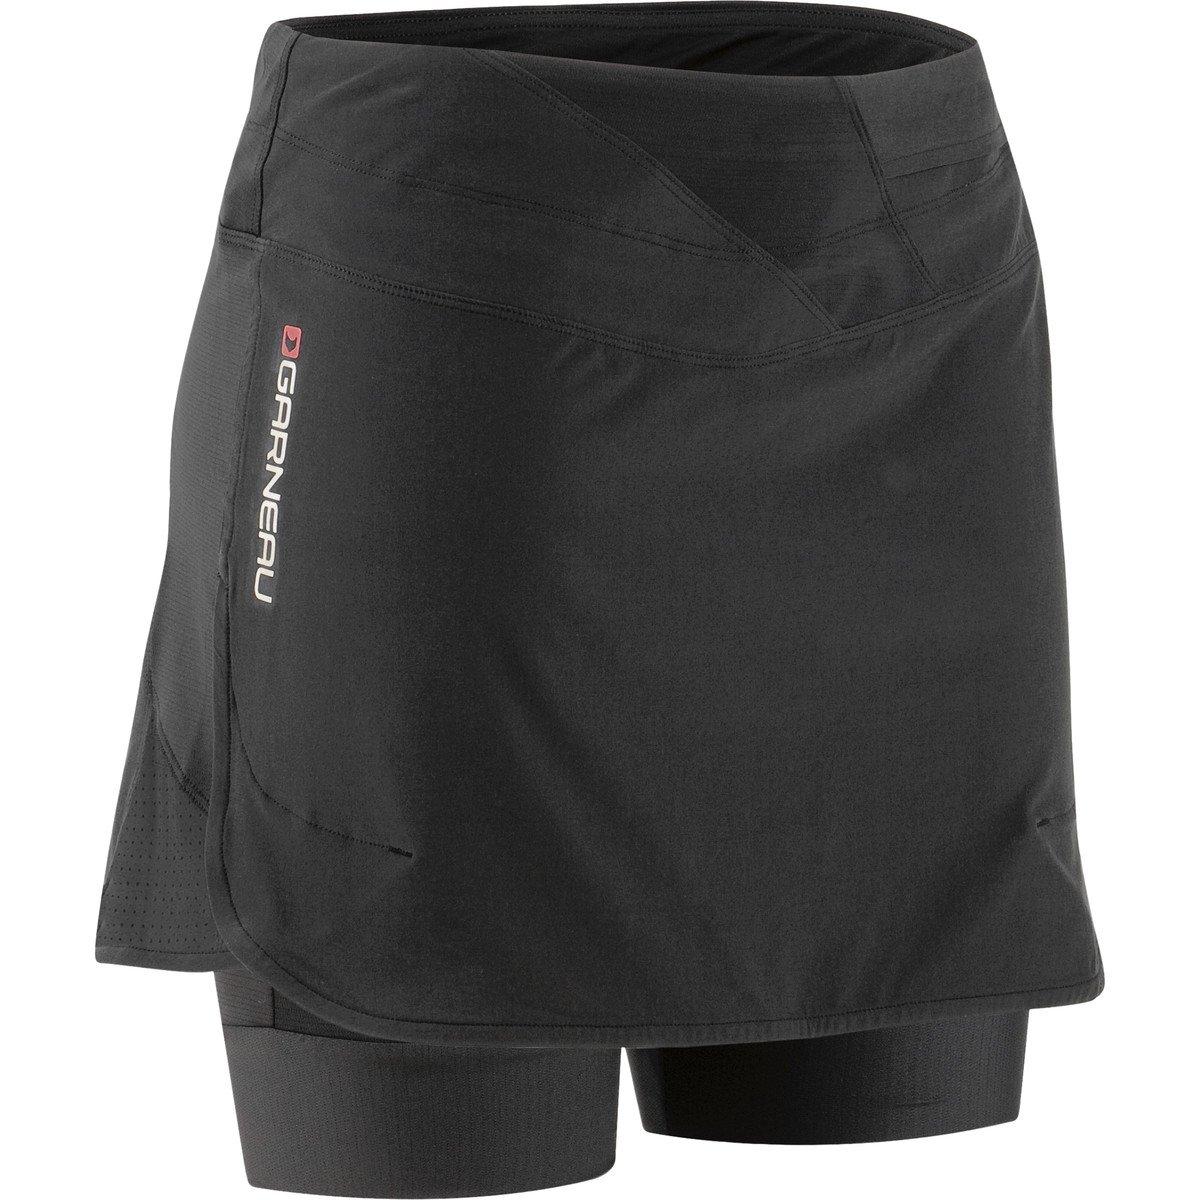 Louis Garneau Women's Rio Cycling Skort, Black, XX-Large by Louis Garneau